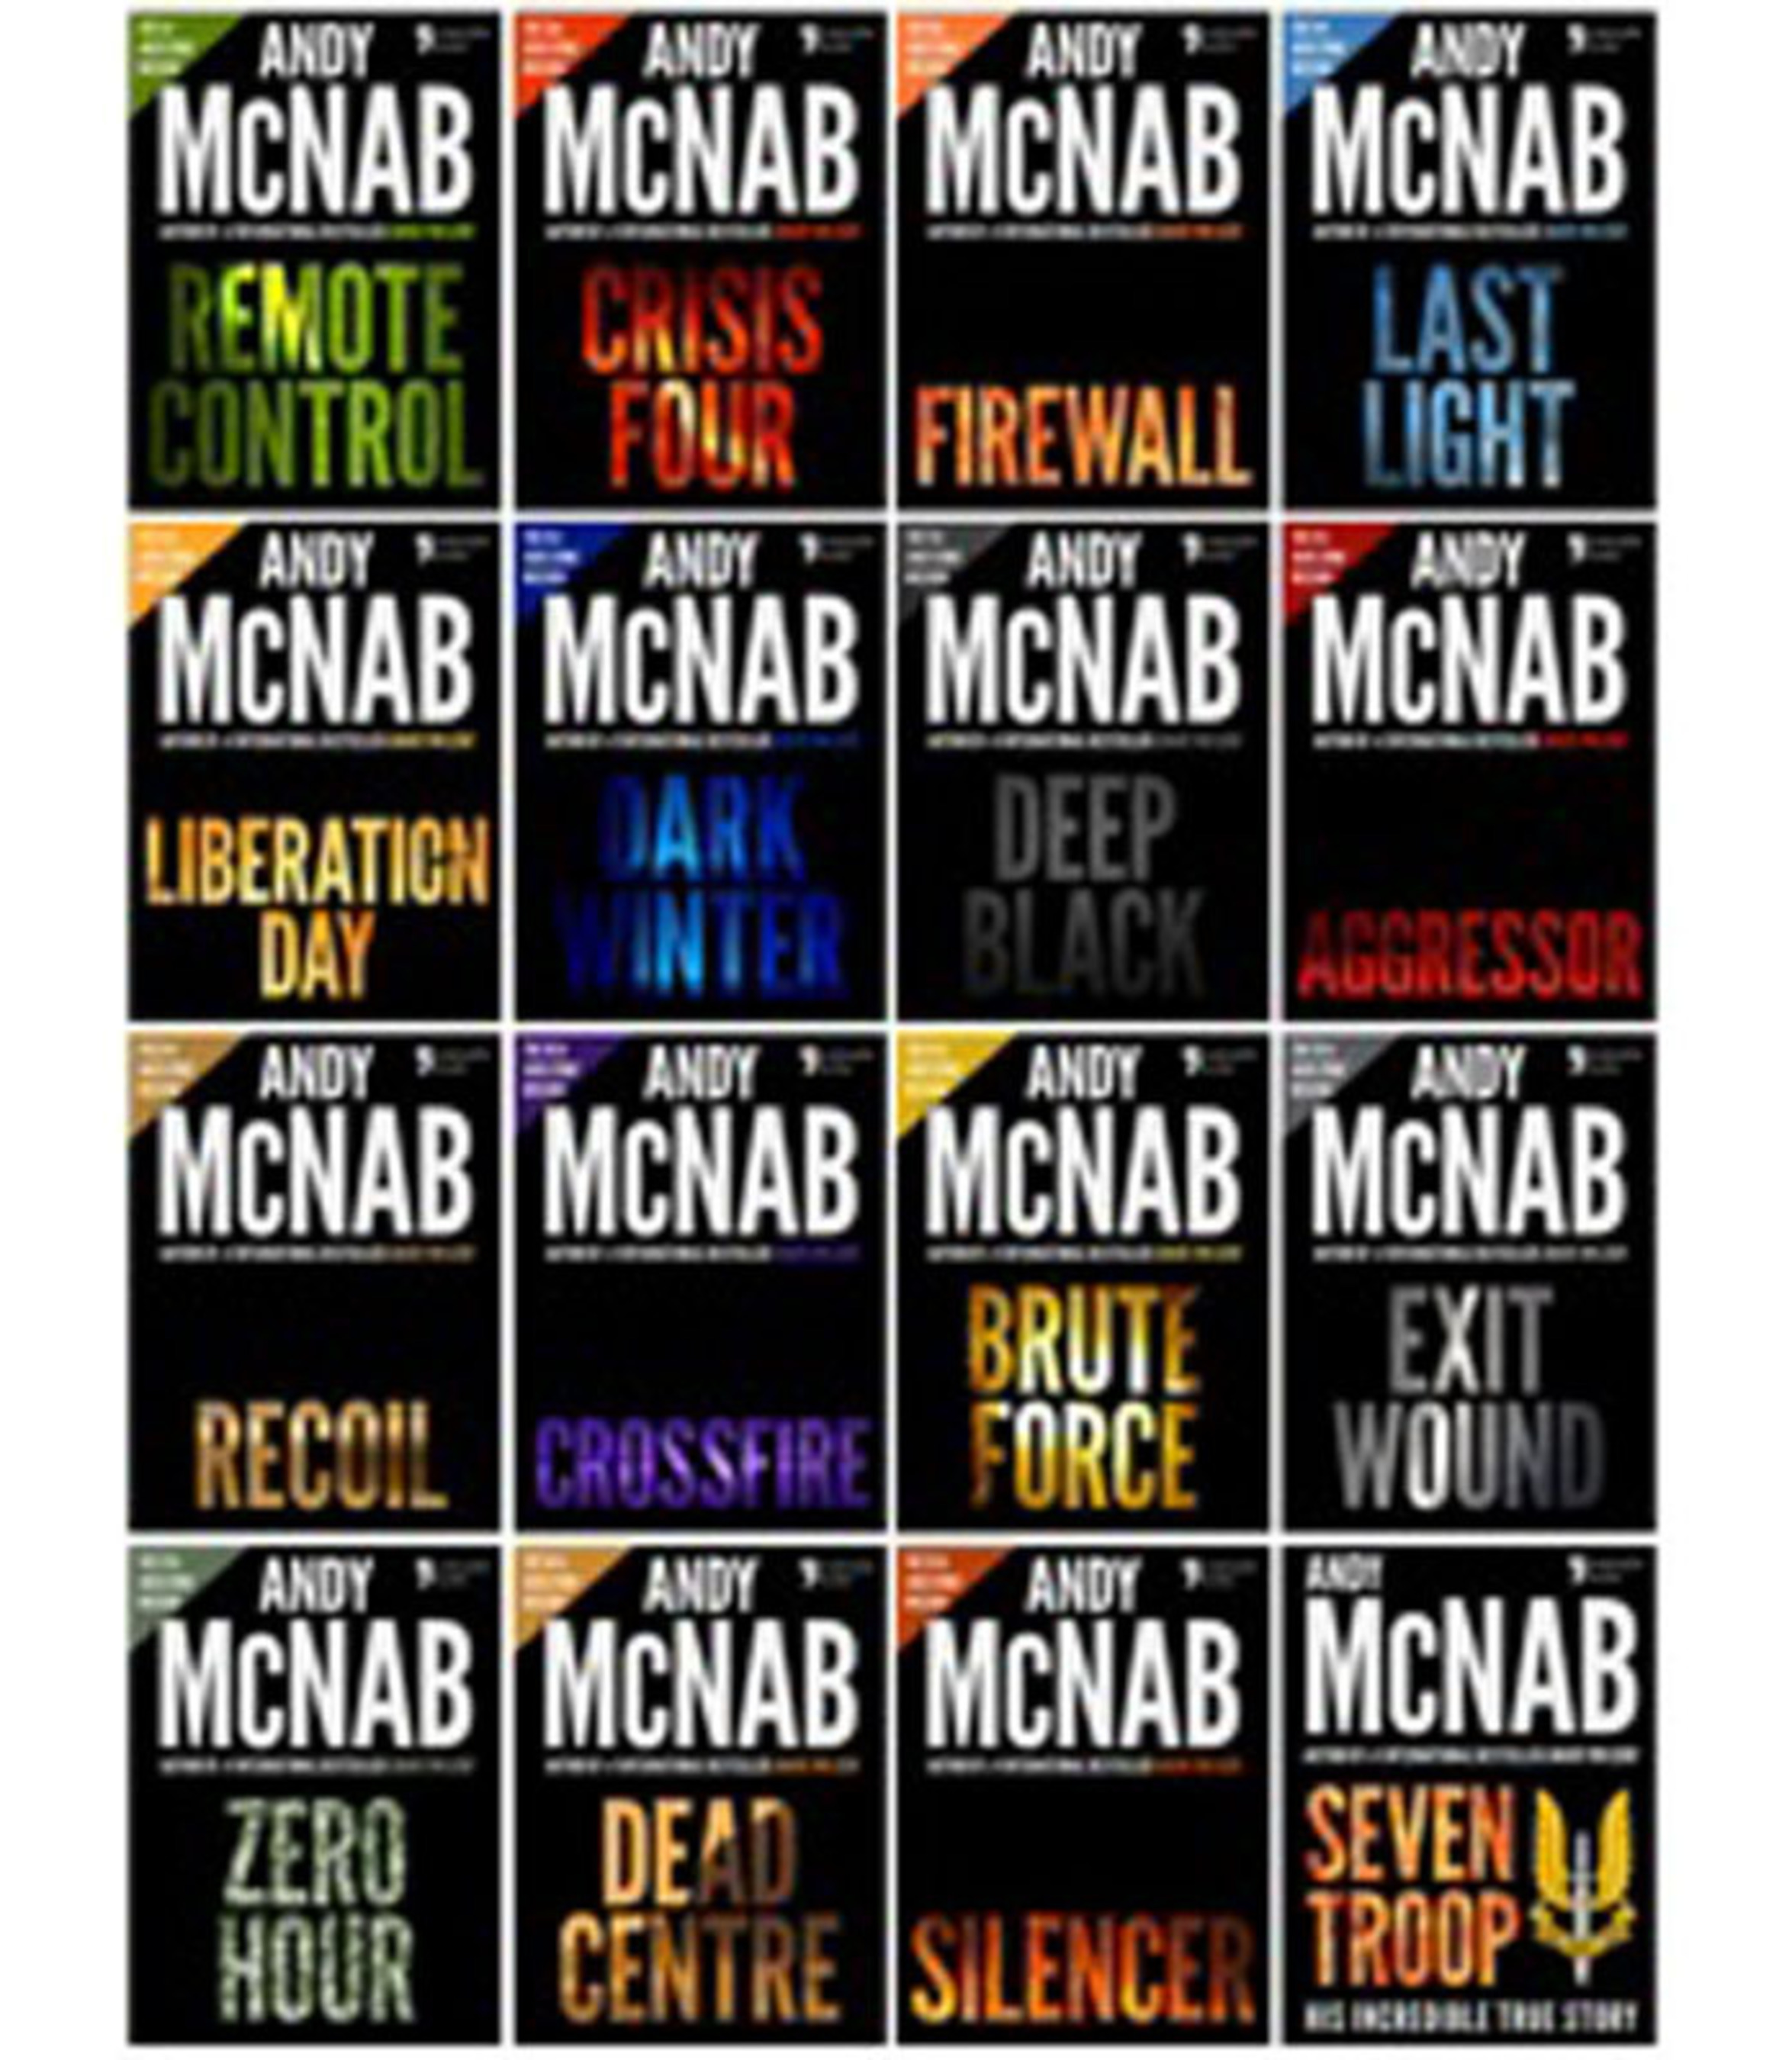 Andy McNab book covers.  (PRNewsFoto/Apostrophe Books)